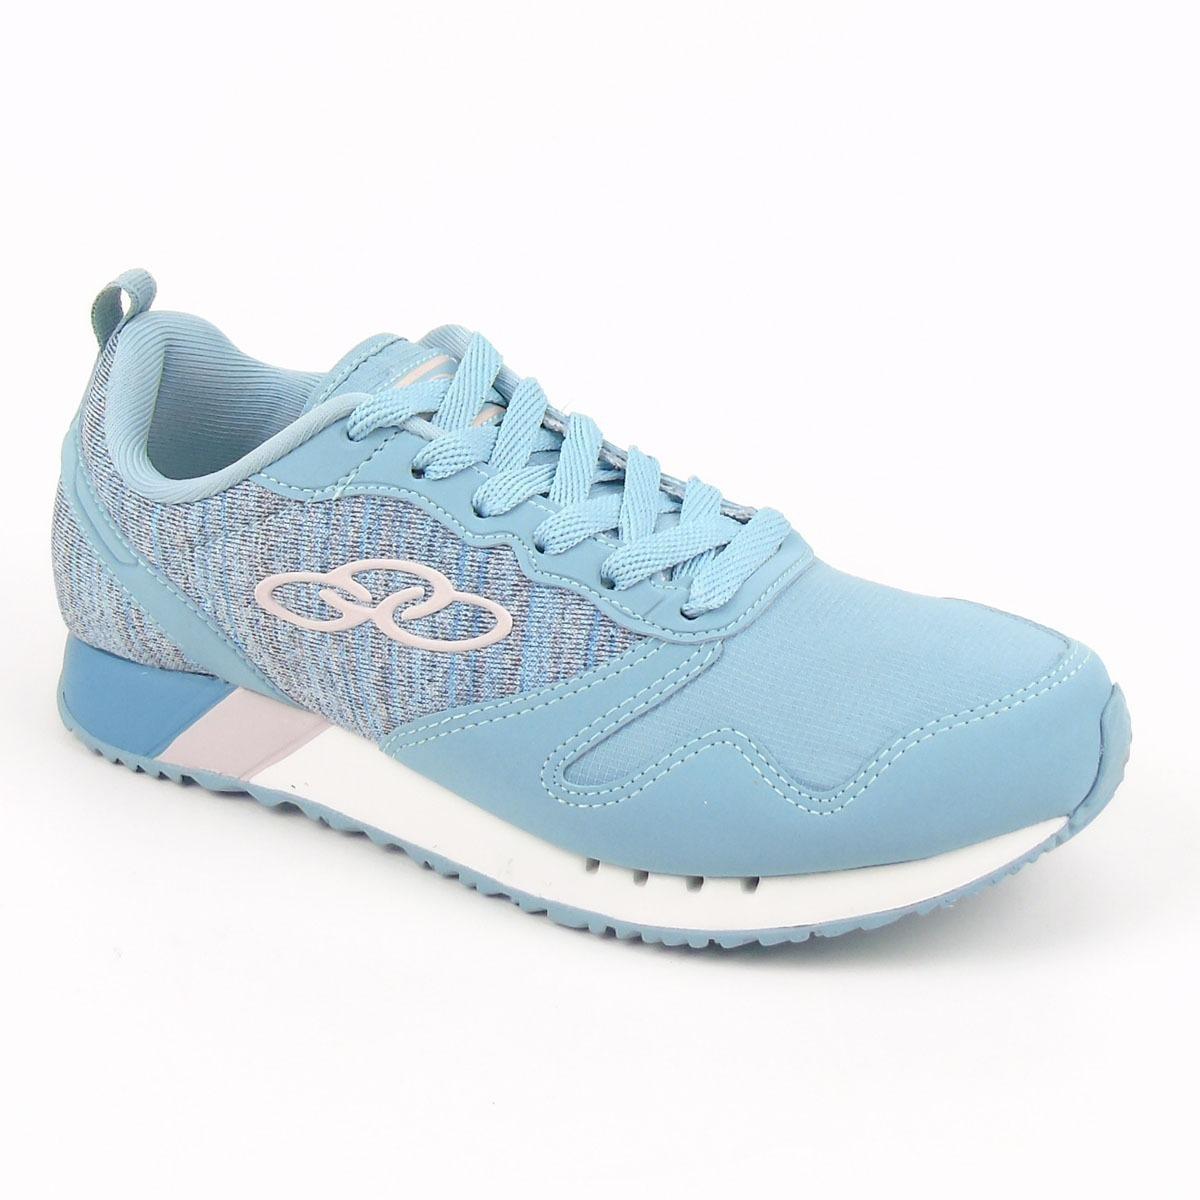 29990e110fa tenis olympikus flashback 484 original azul piscina feminino. Carregando  zoom.